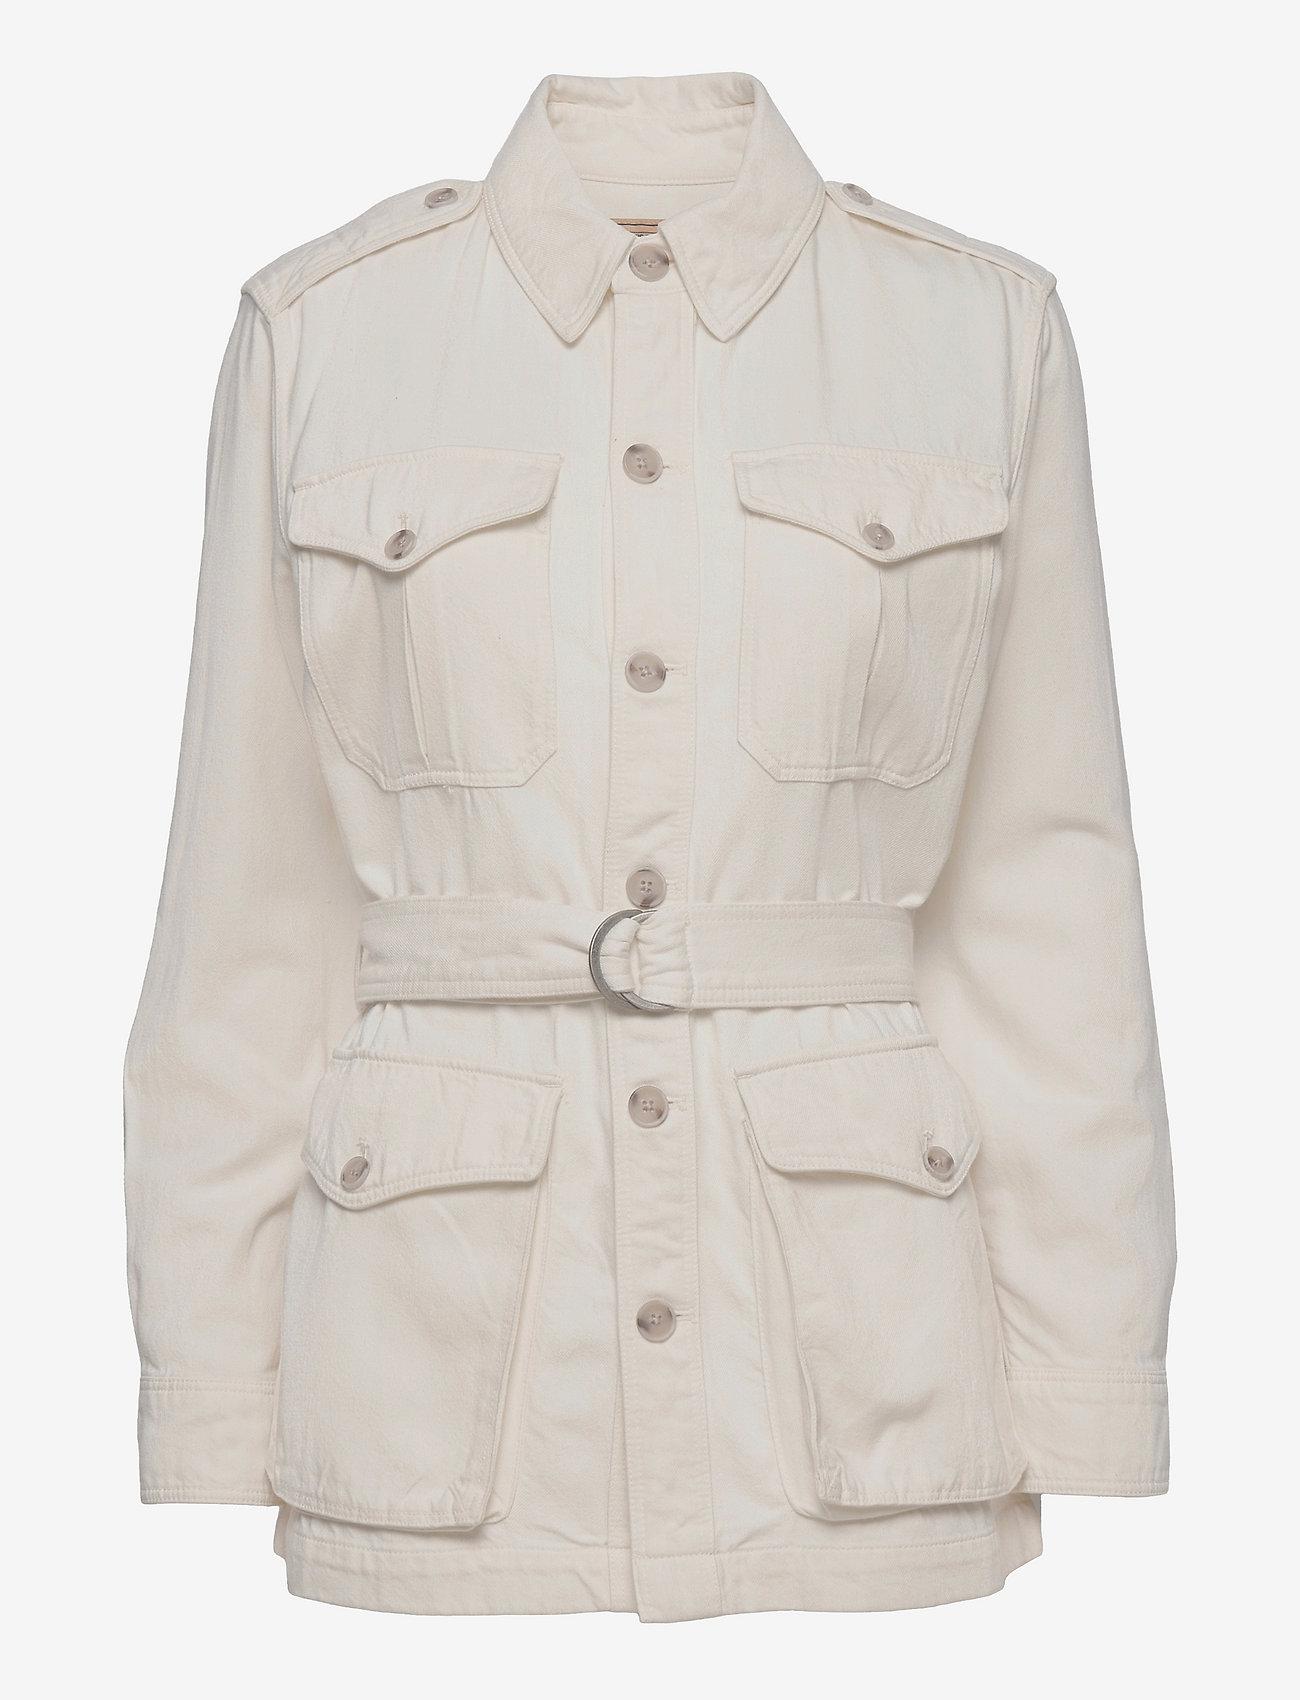 Polo Ralph Lauren - SFRI JKT-JACKET - utility jackets - natural - 0